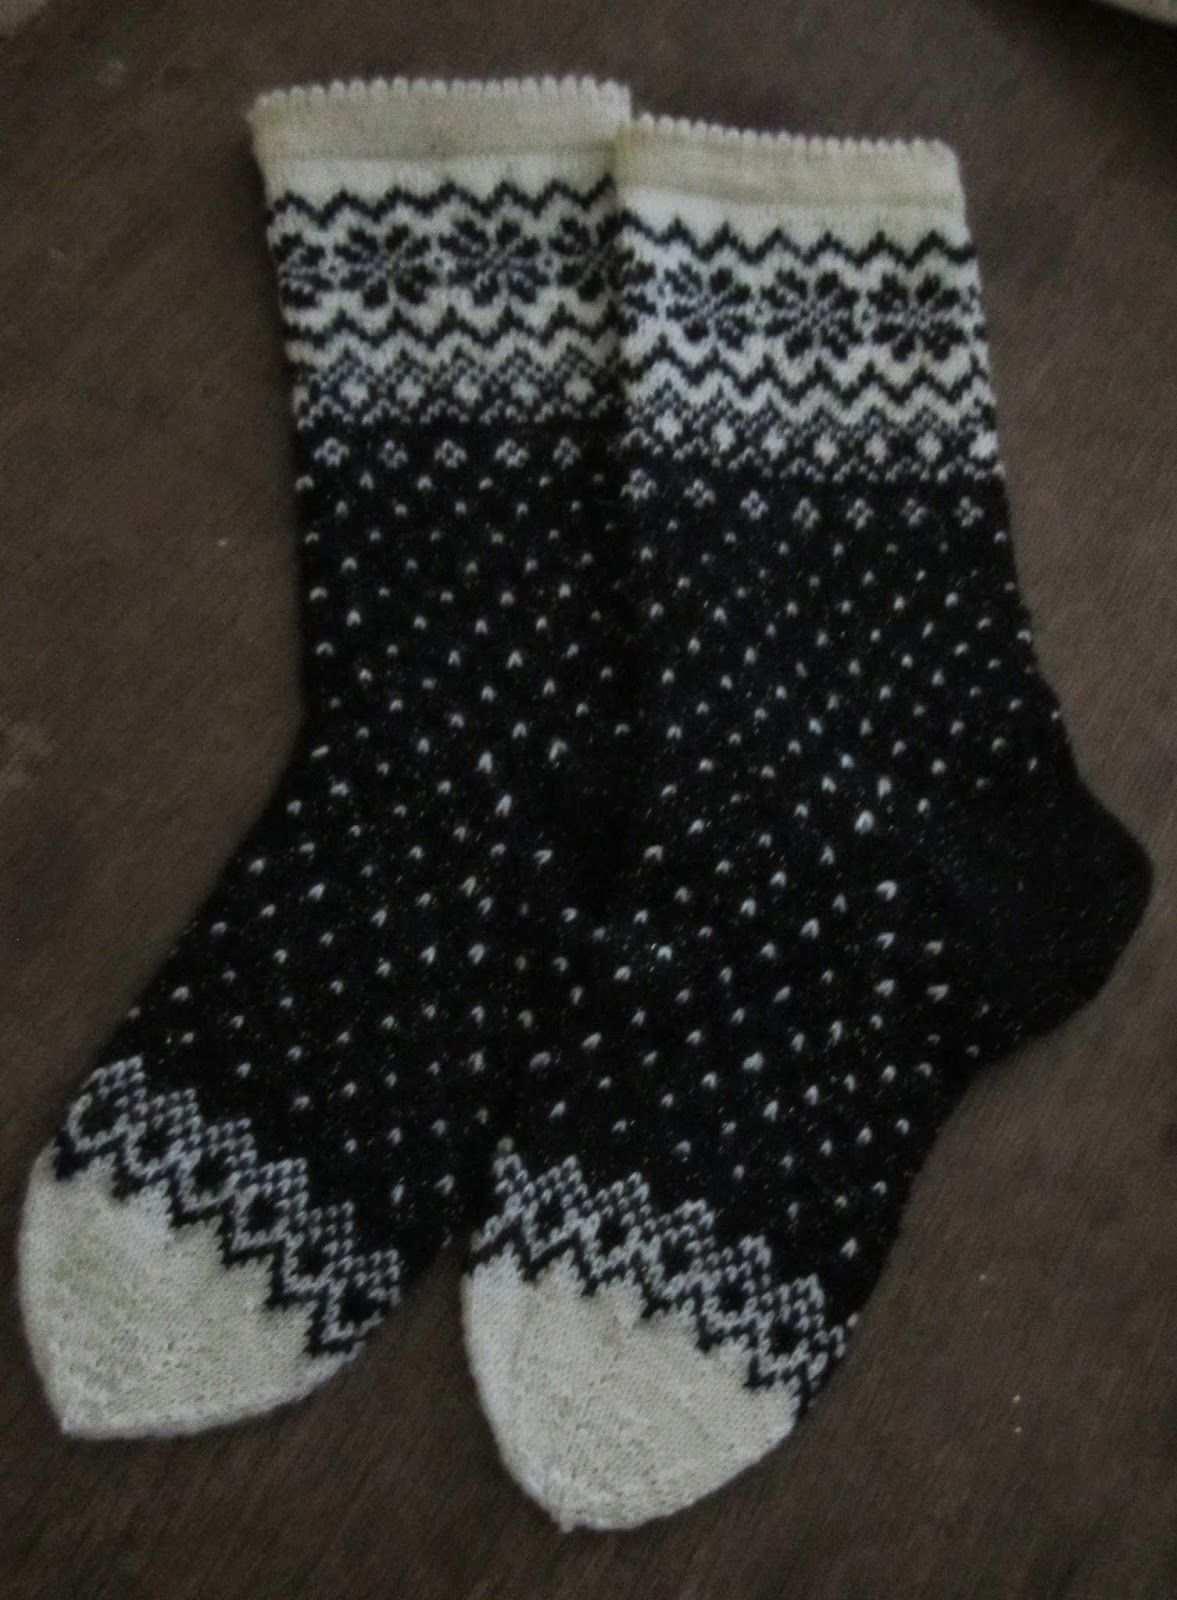 Tageswerke Mein Handarbeitsblog Norweger Socken Socken Stricken Muster Socken Stricken